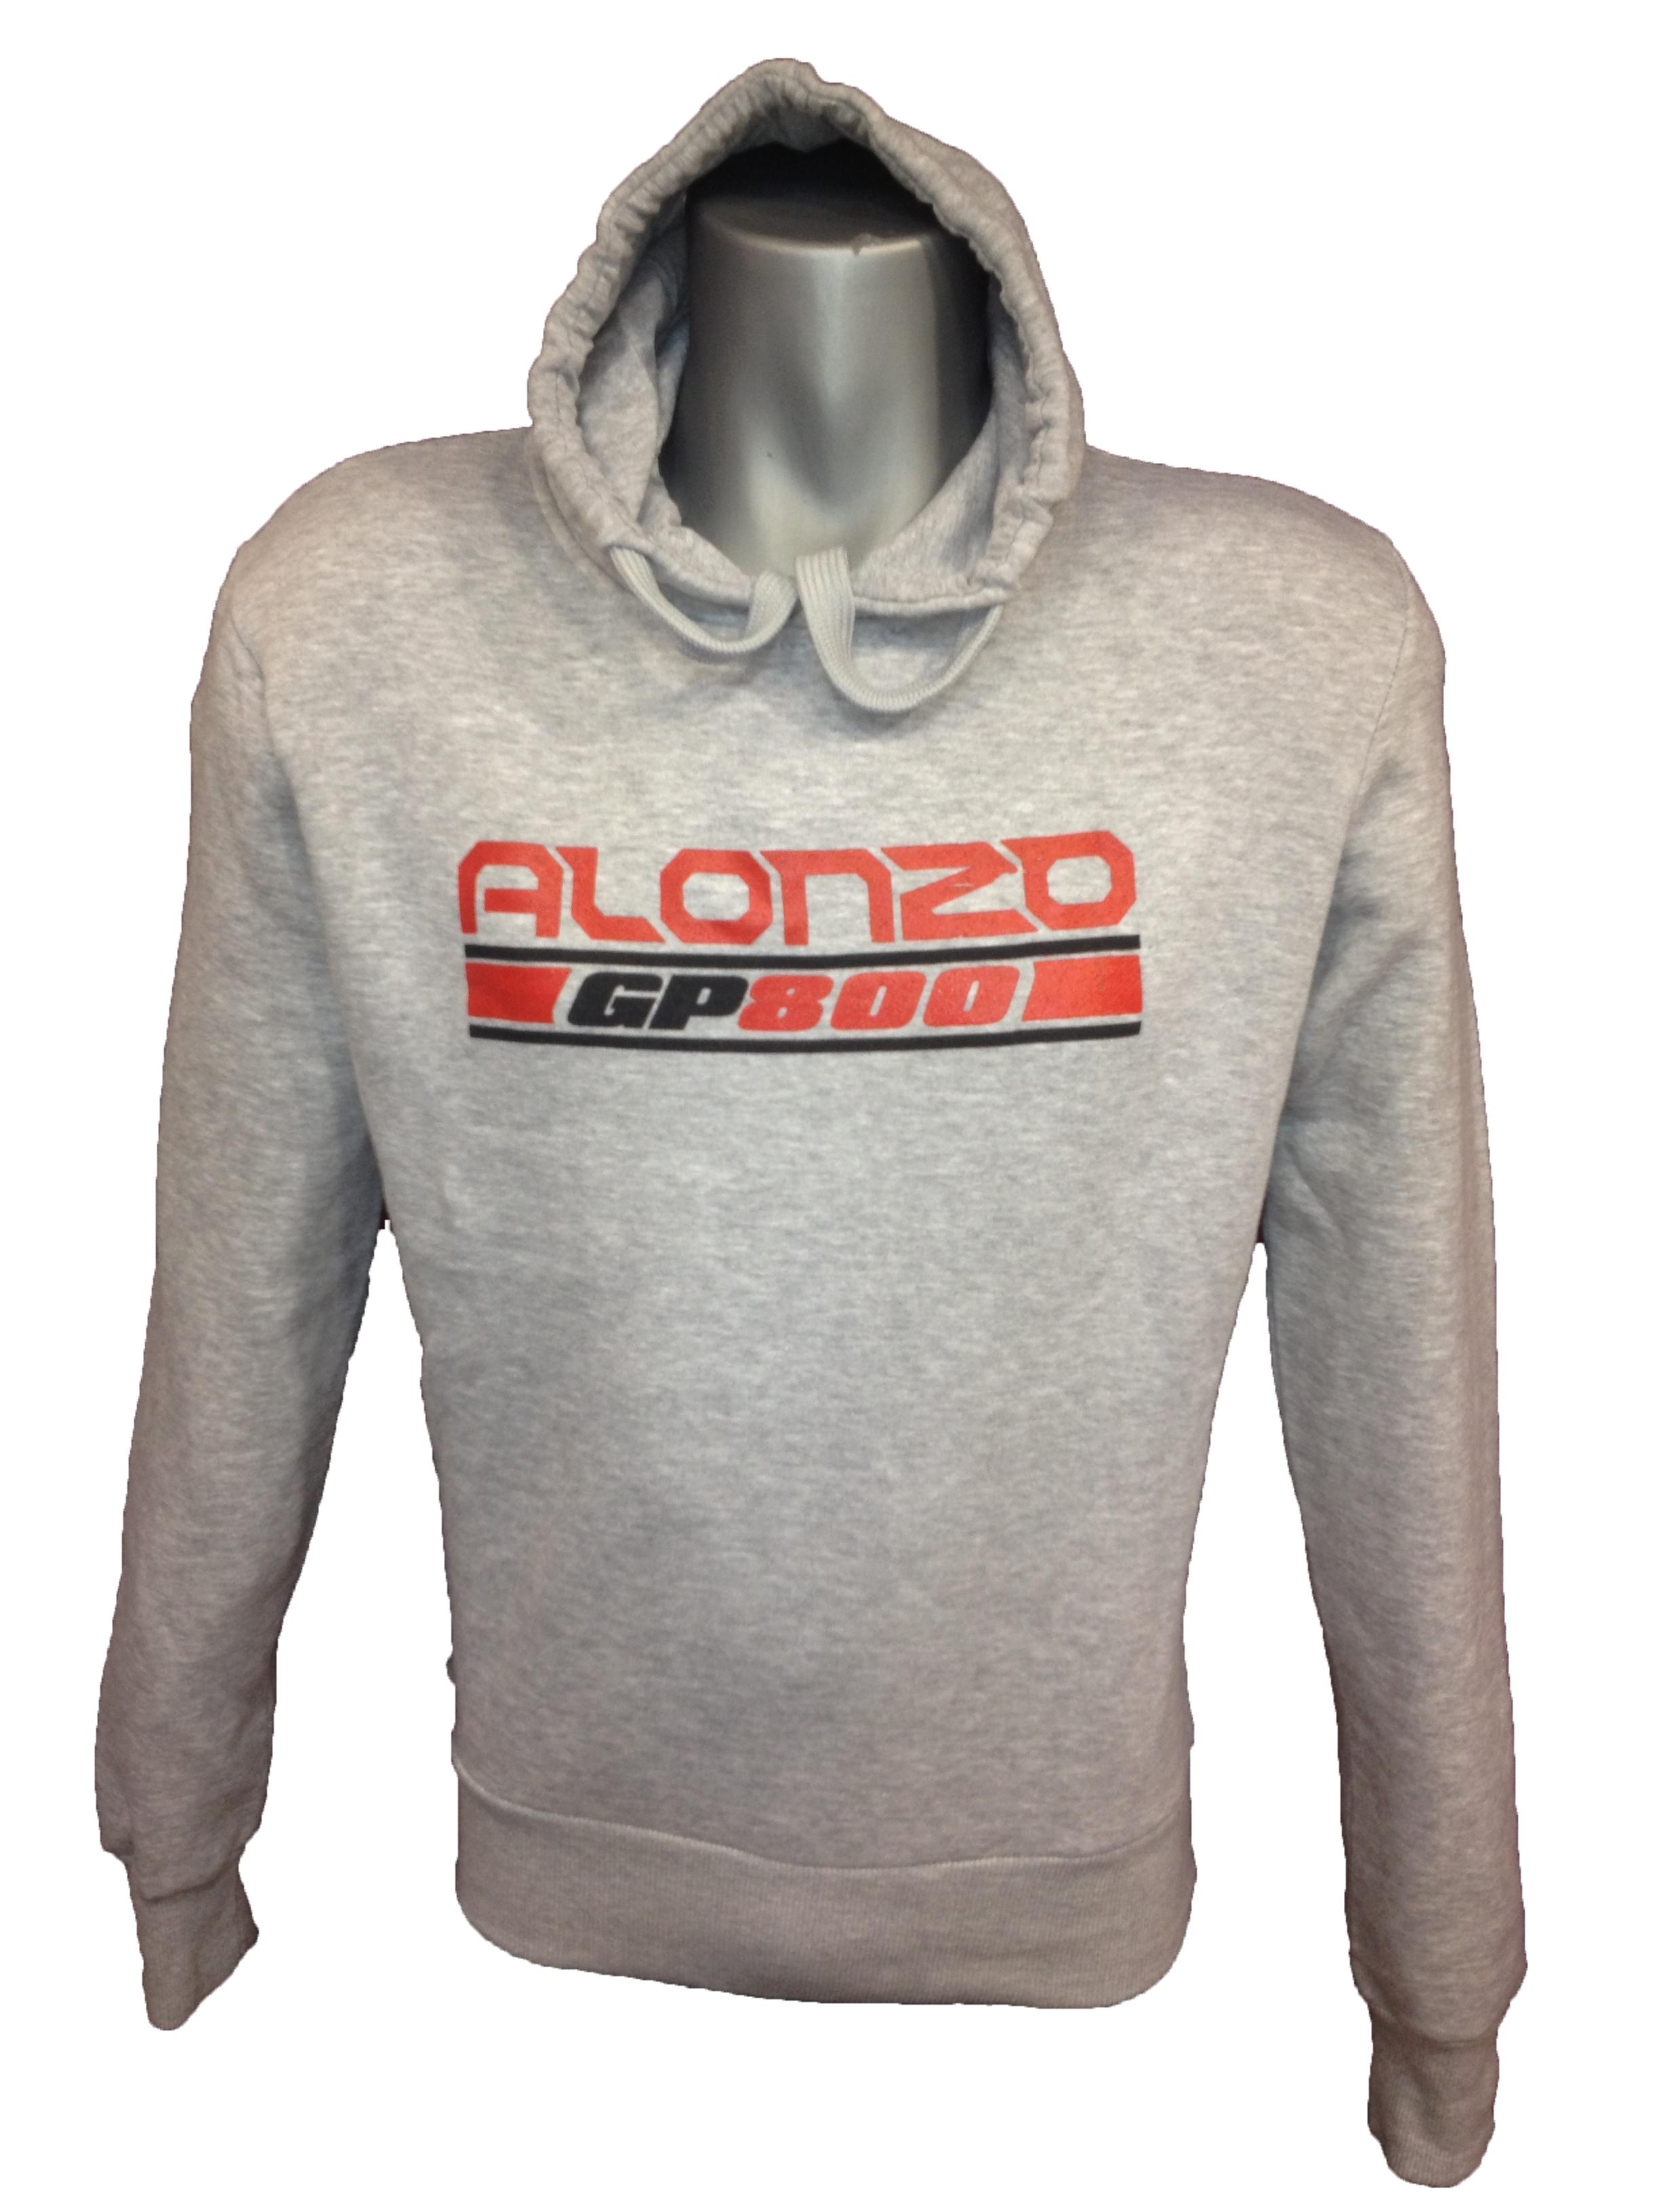 alonzo gp 800